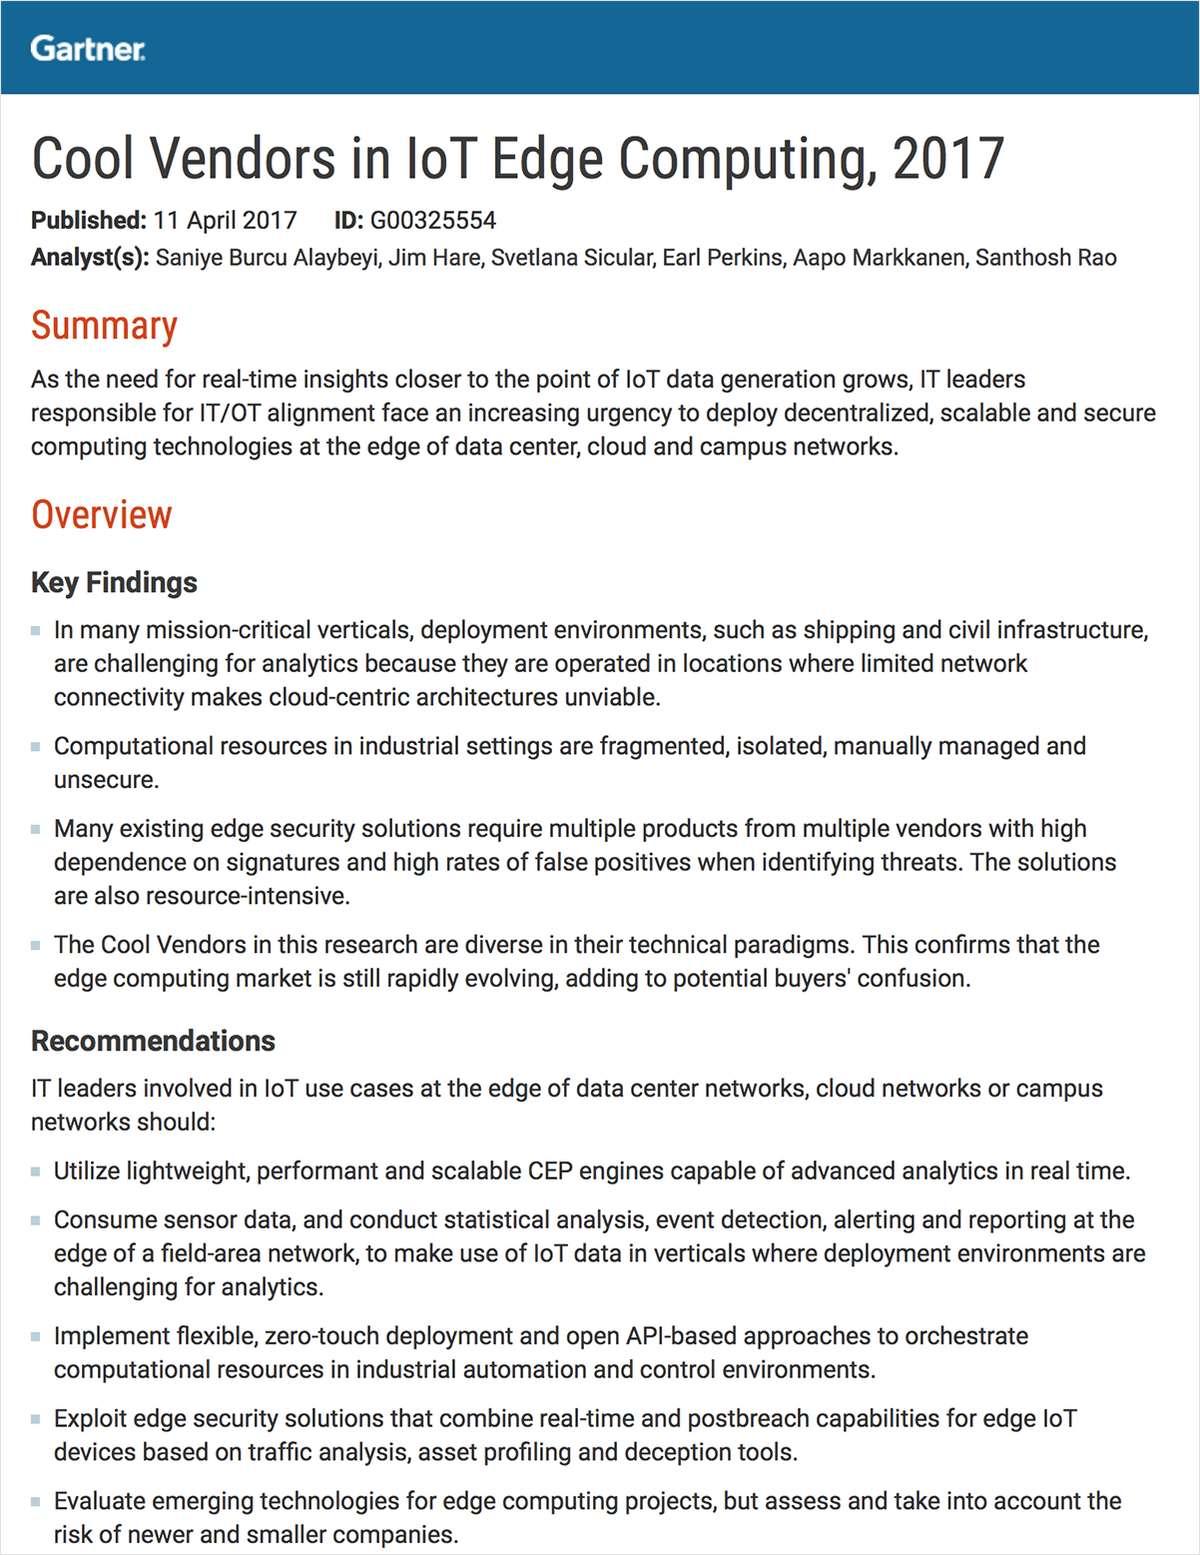 Gartner Cool Vendors in IoT Edge Computing, 2017